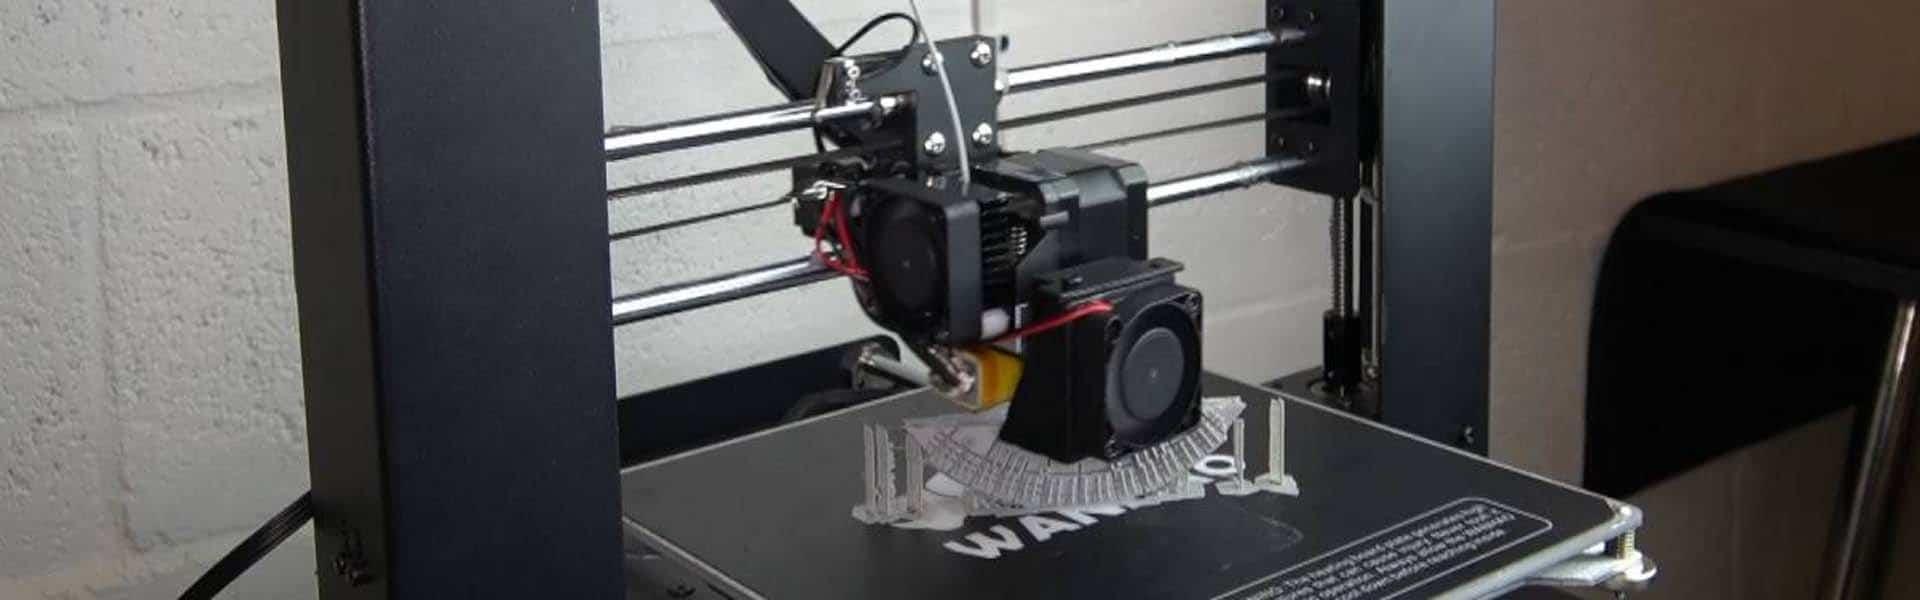 Wanhao Duplicator i3 Review